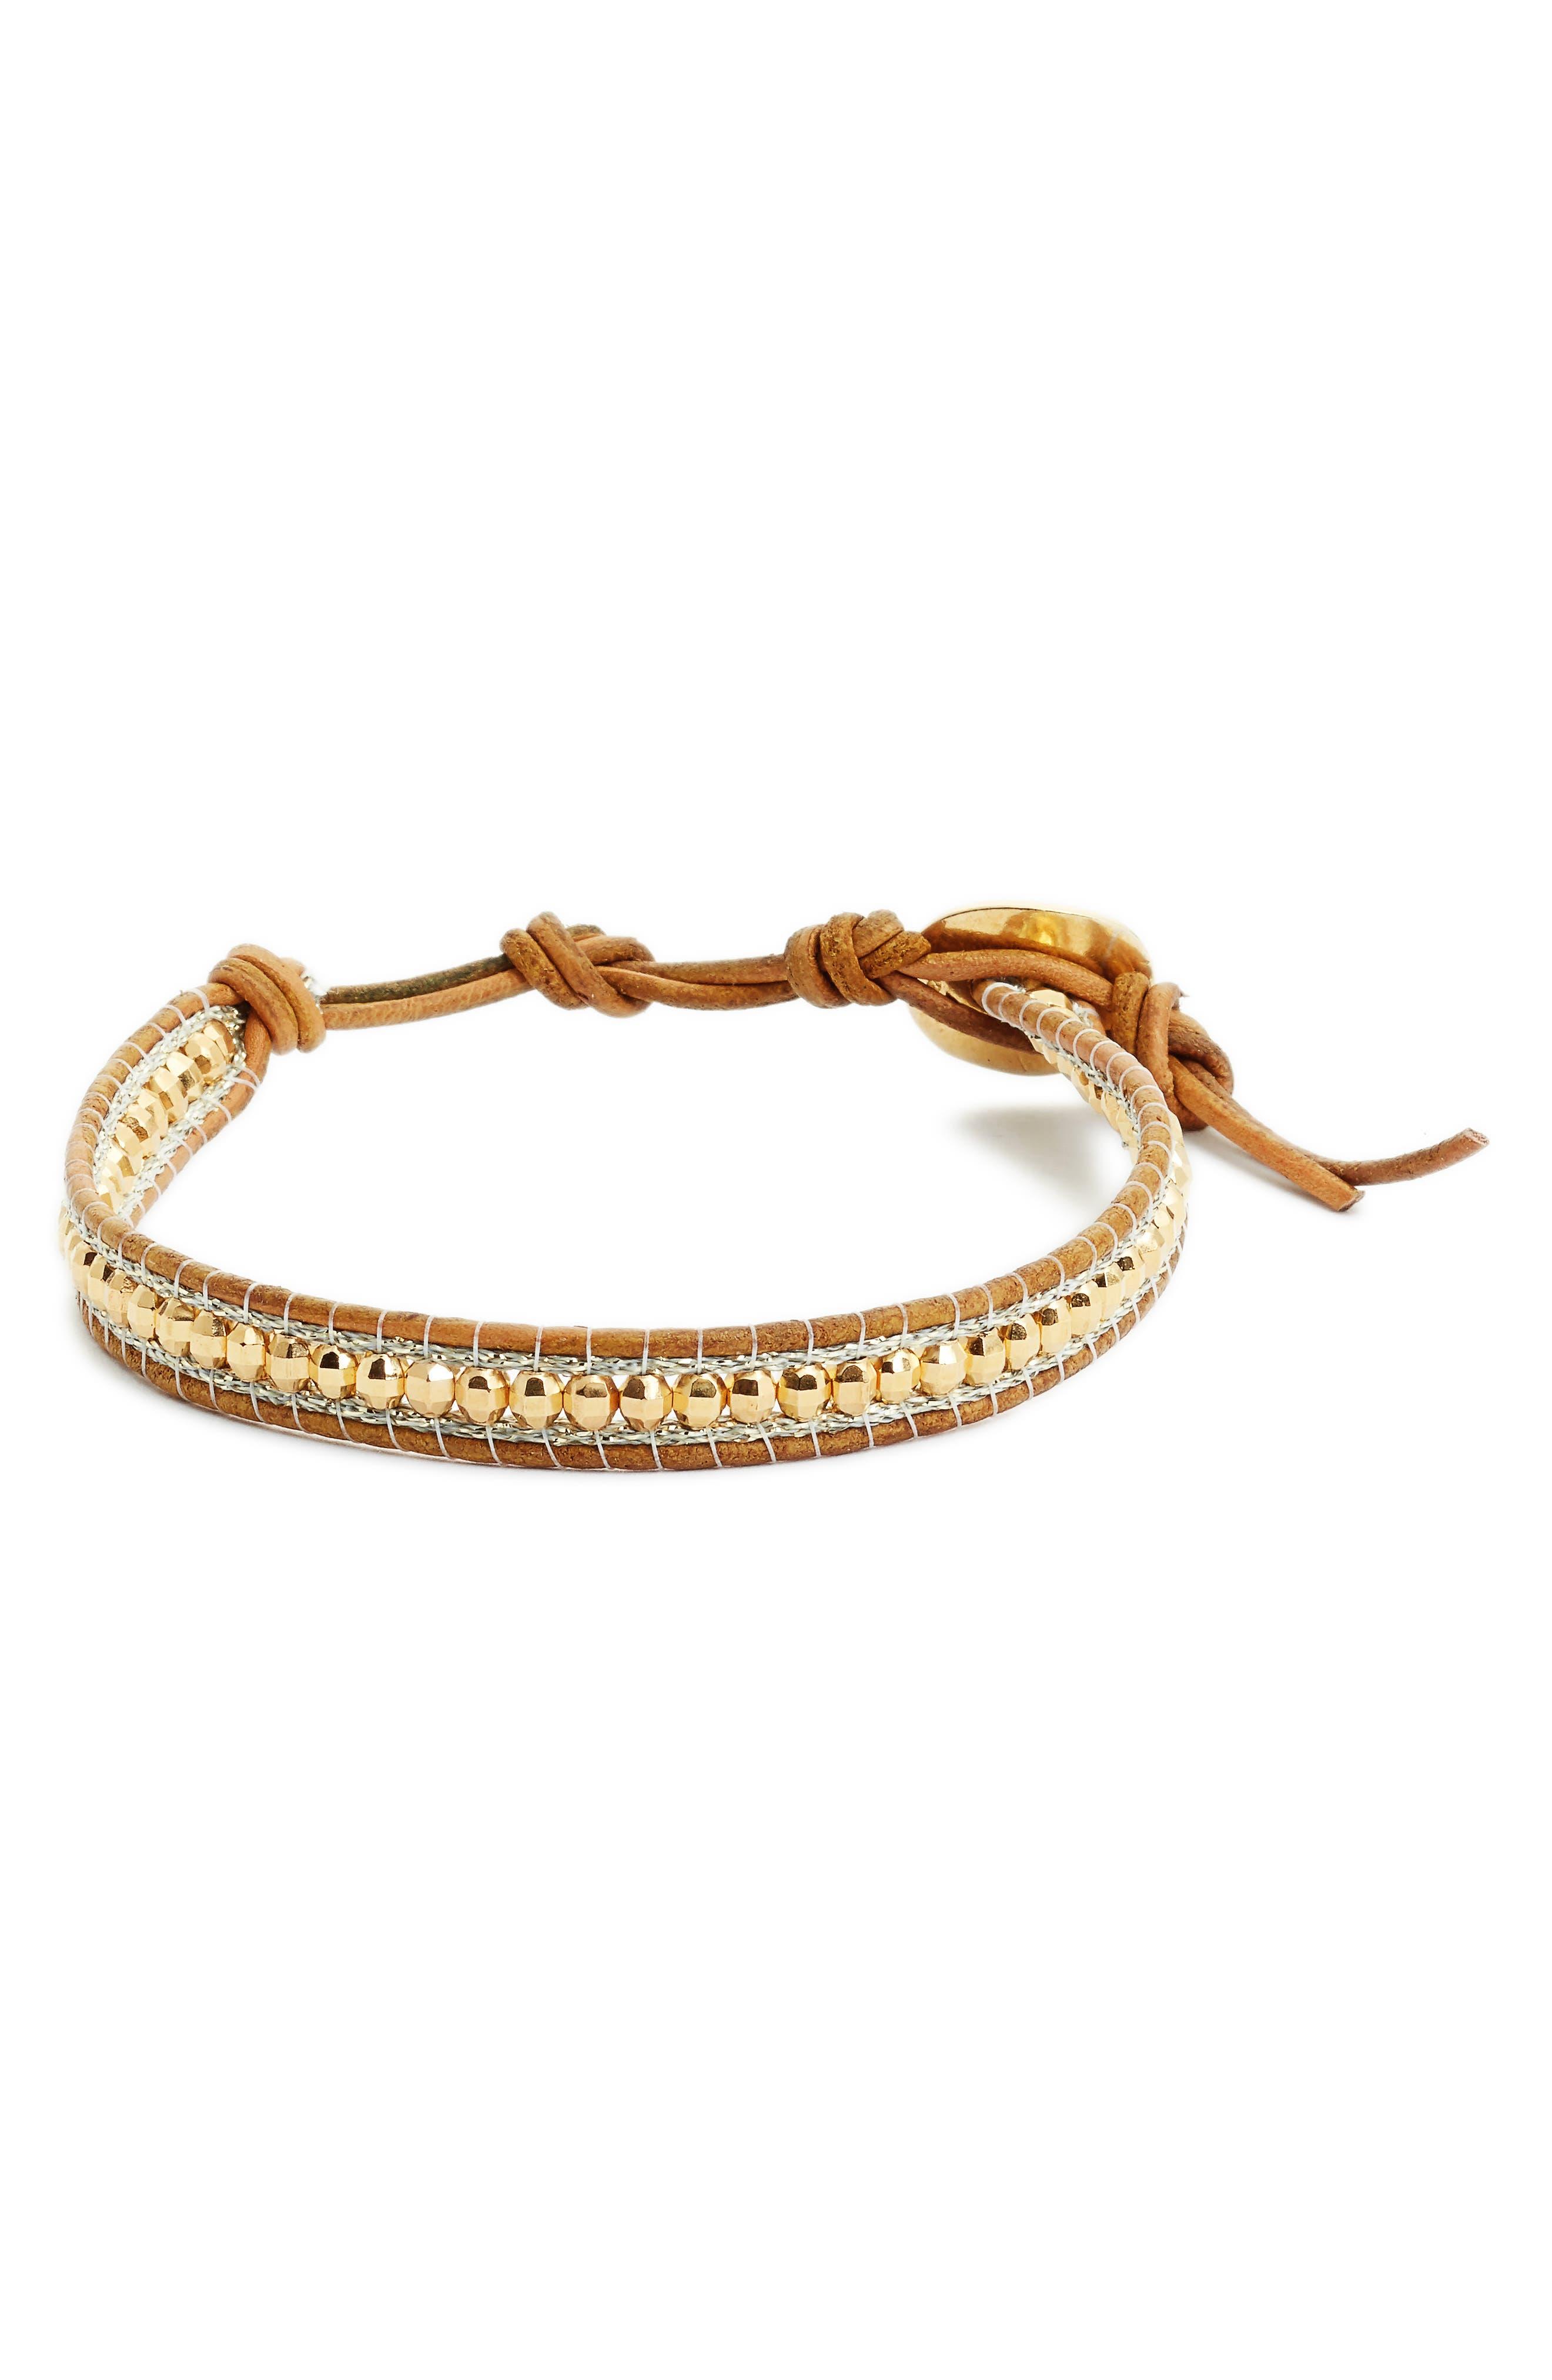 Beaded Bracelet,                             Main thumbnail 1, color,                             YELLOW MIX